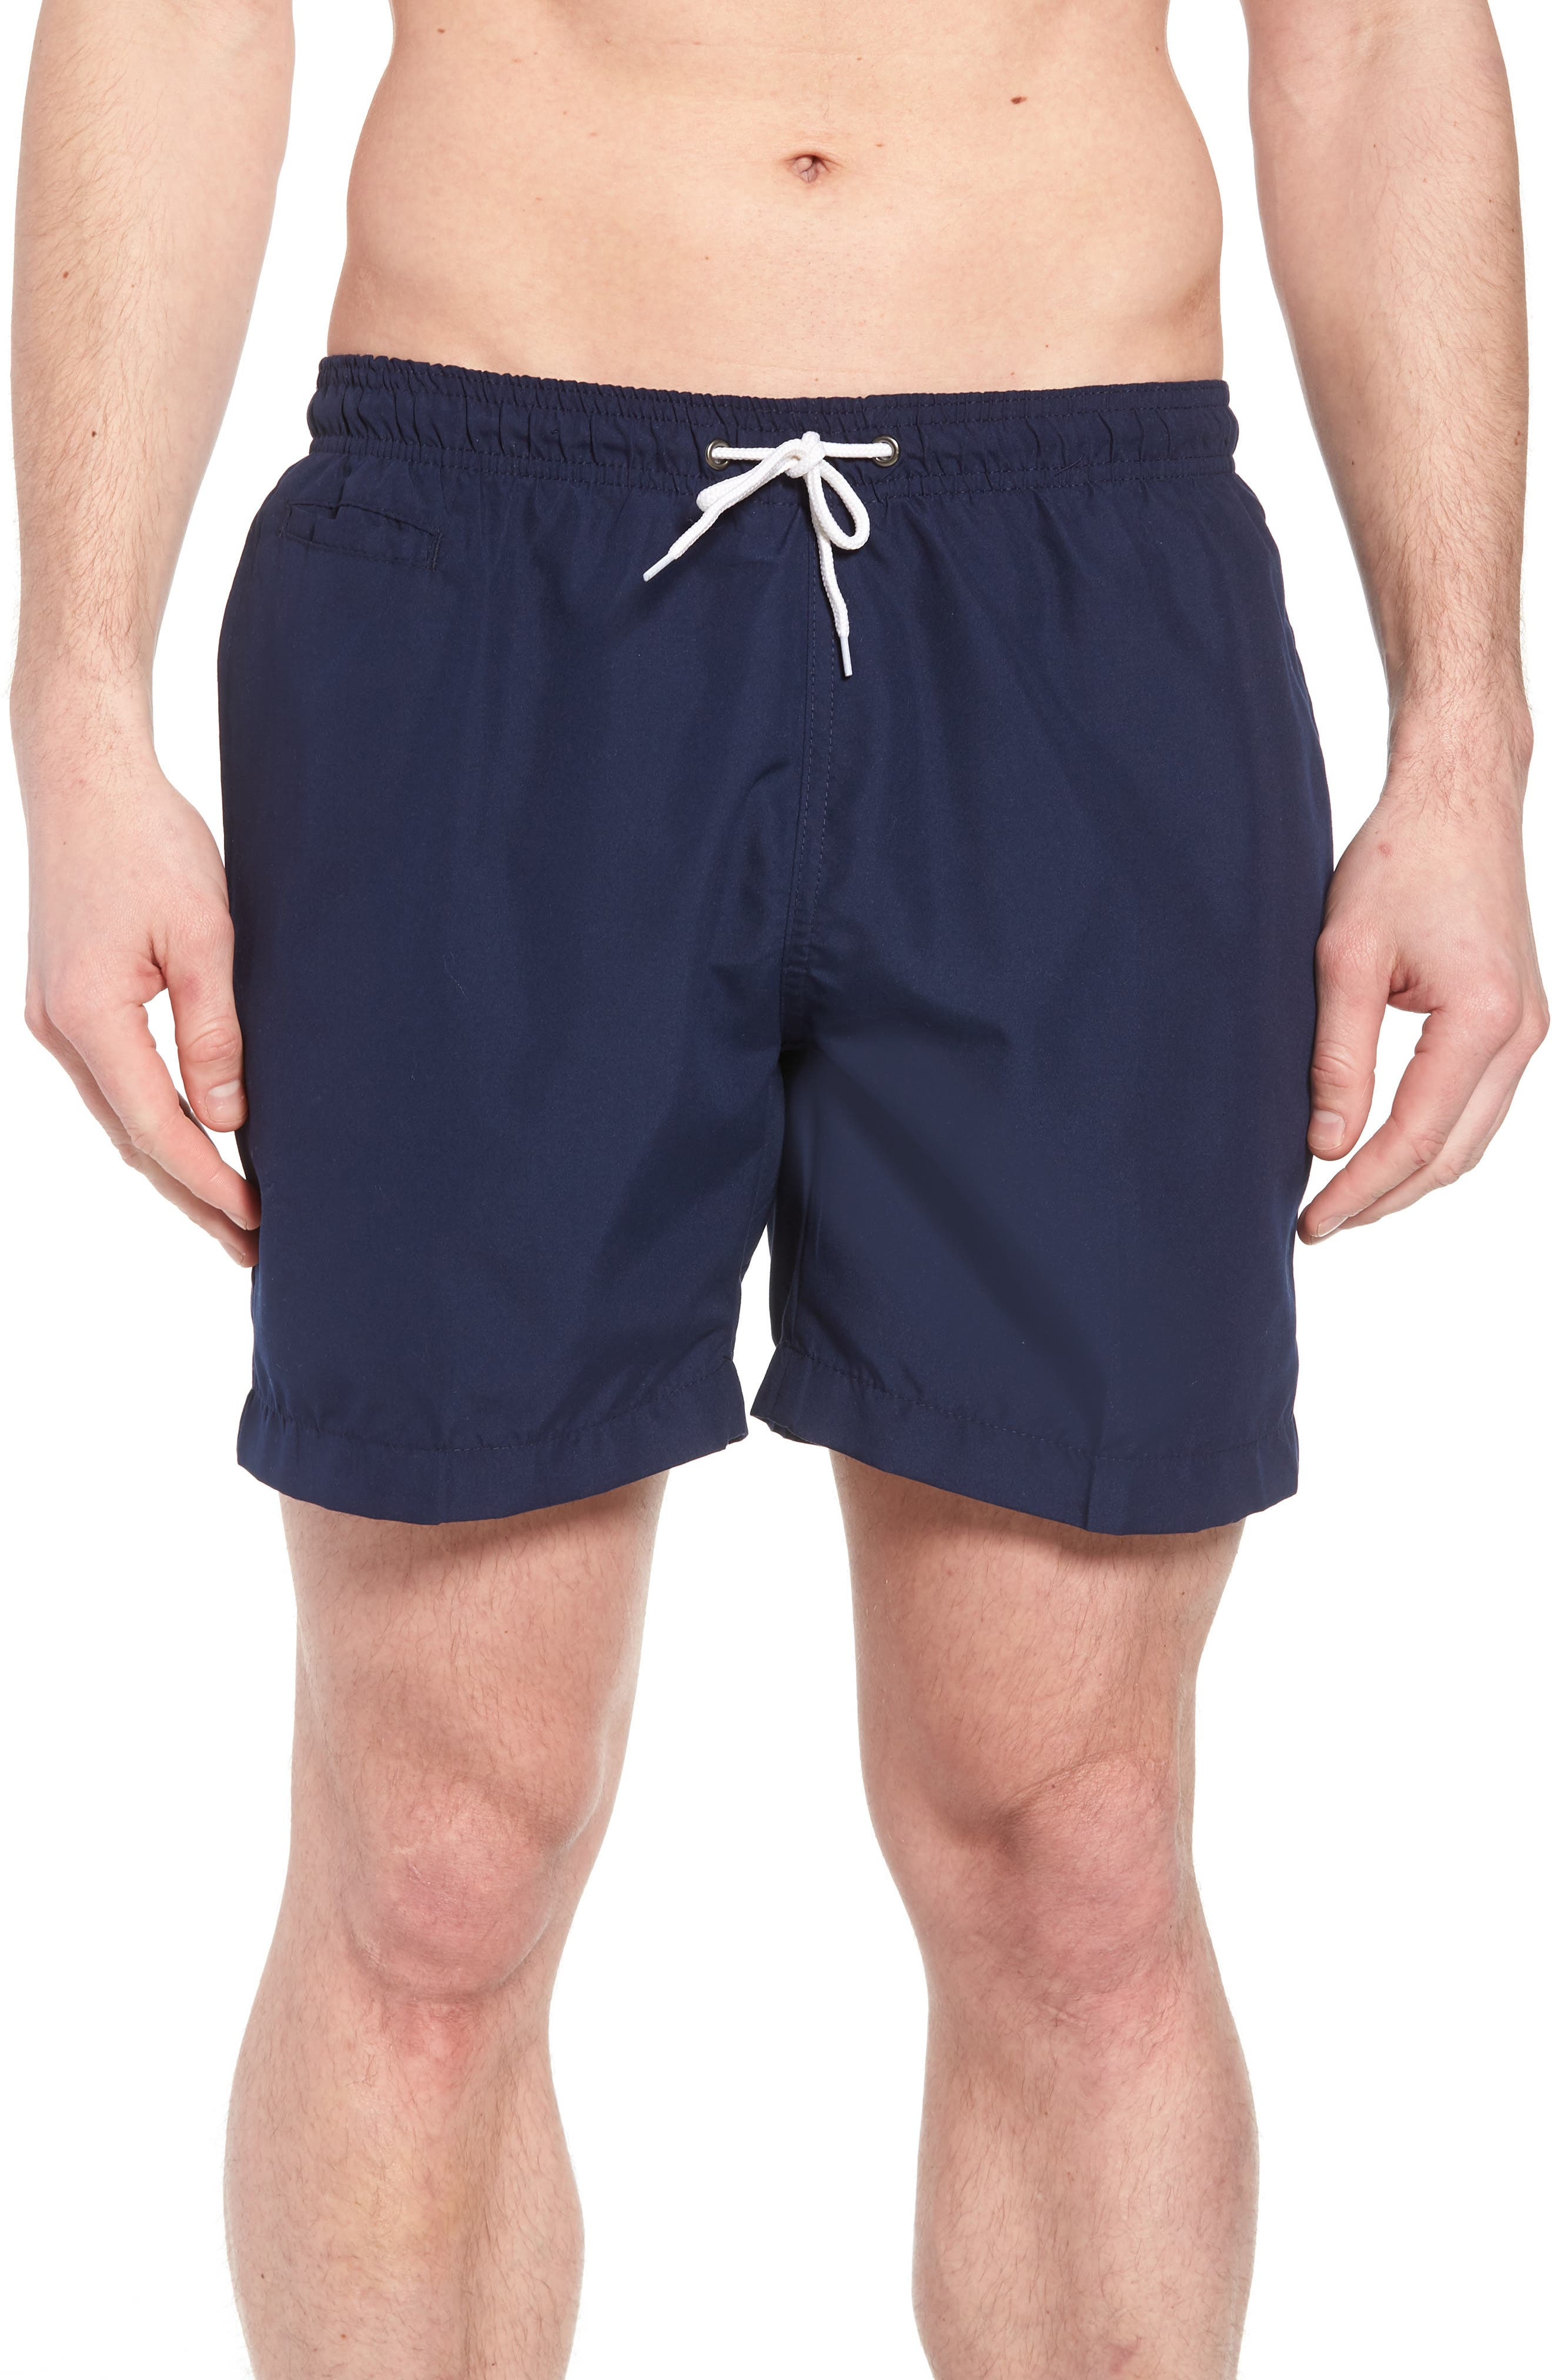 Trunks Surf & Swim 'San O' Volley Swim Shorts,                         Main,                         color, Marine